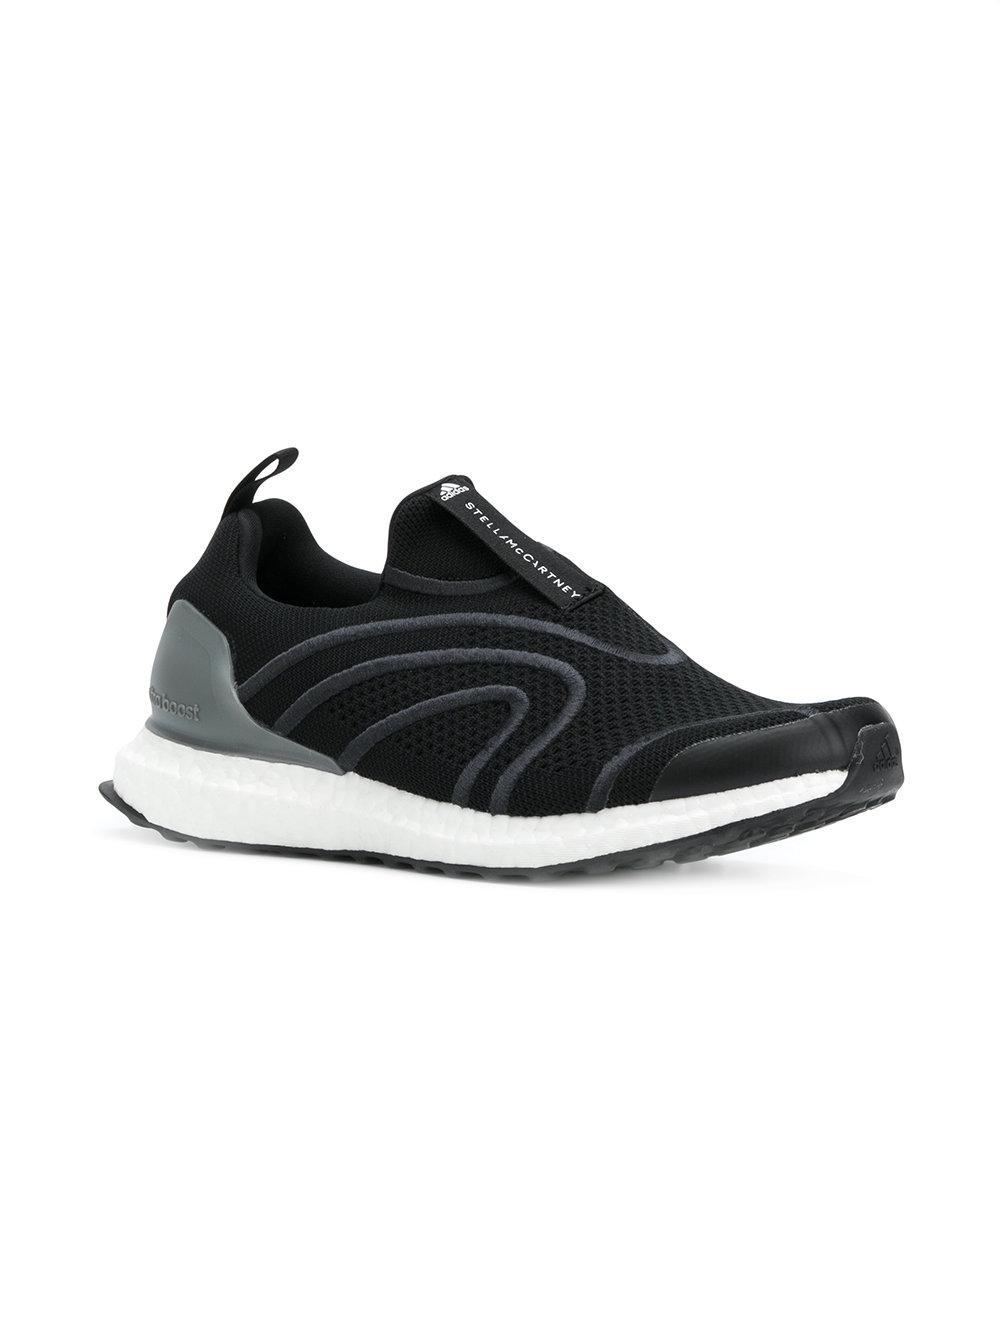 ddd5e9ac9 adidas By Stella McCartney Ultraboost Uncaged Sneakers in Blue - Lyst